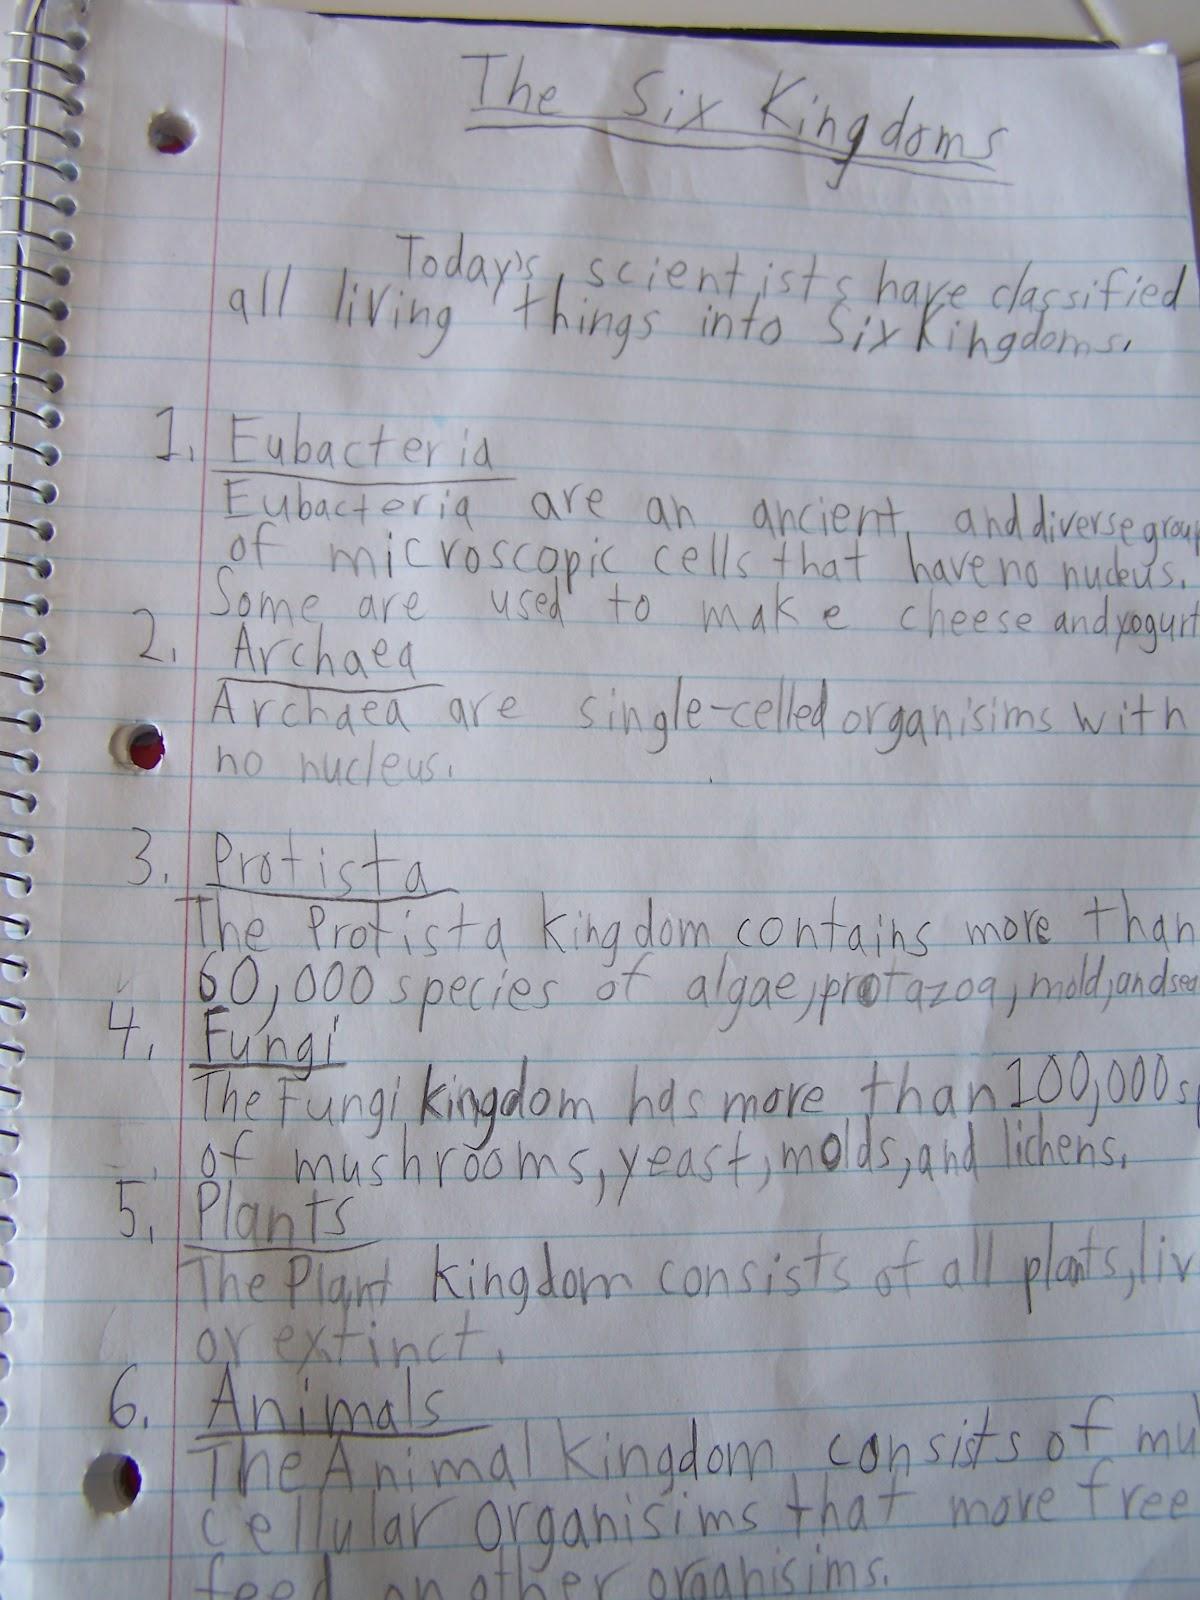 Walnut Hill Homeschool Learning about the Six Kingdoms of Life – The Six Kingdoms Worksheet